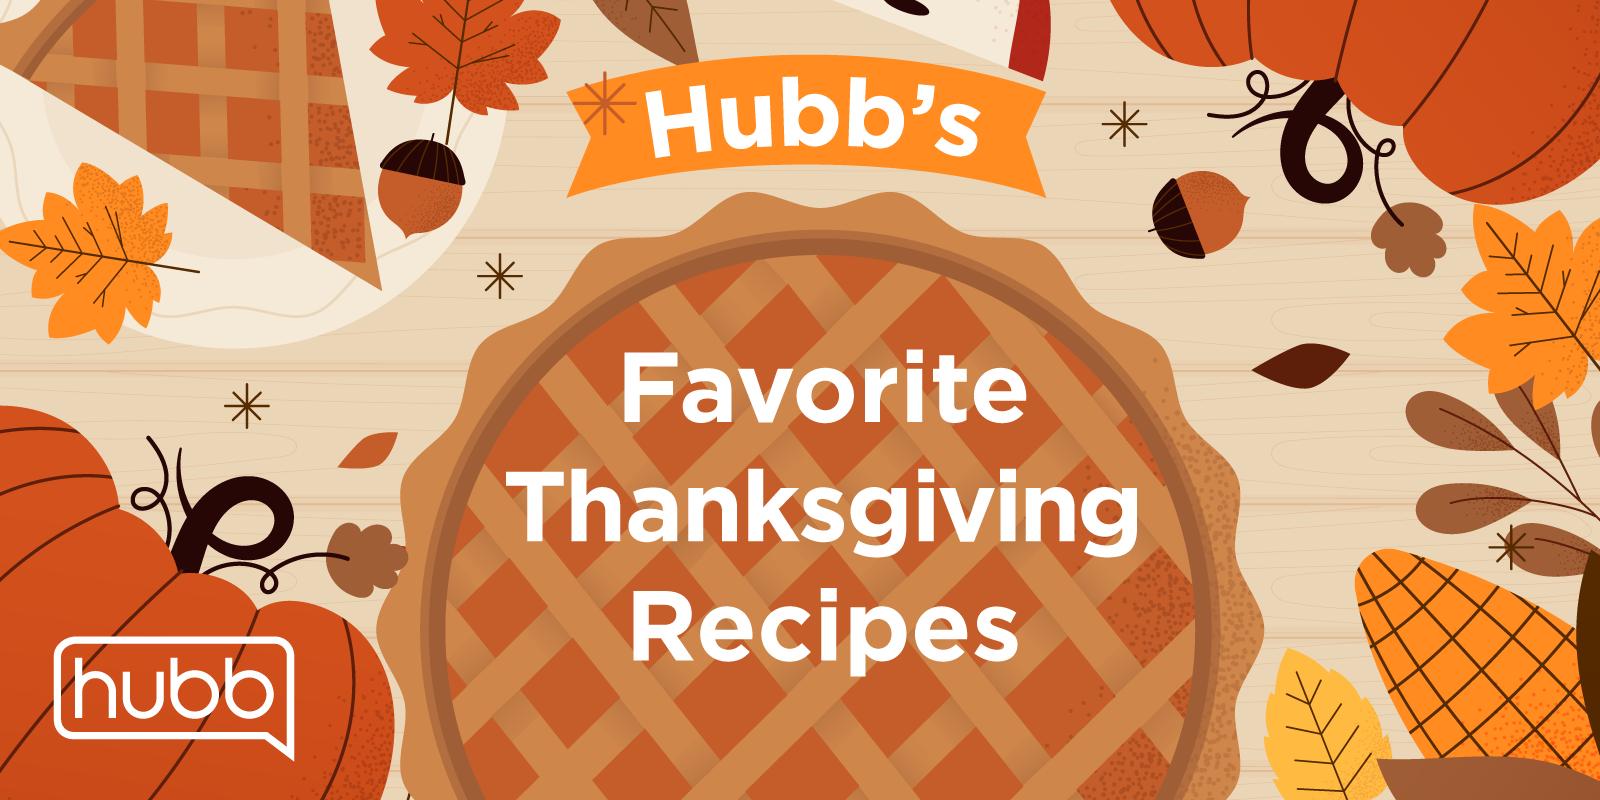 Hubb's favorite thanksgiving recipes social graphic